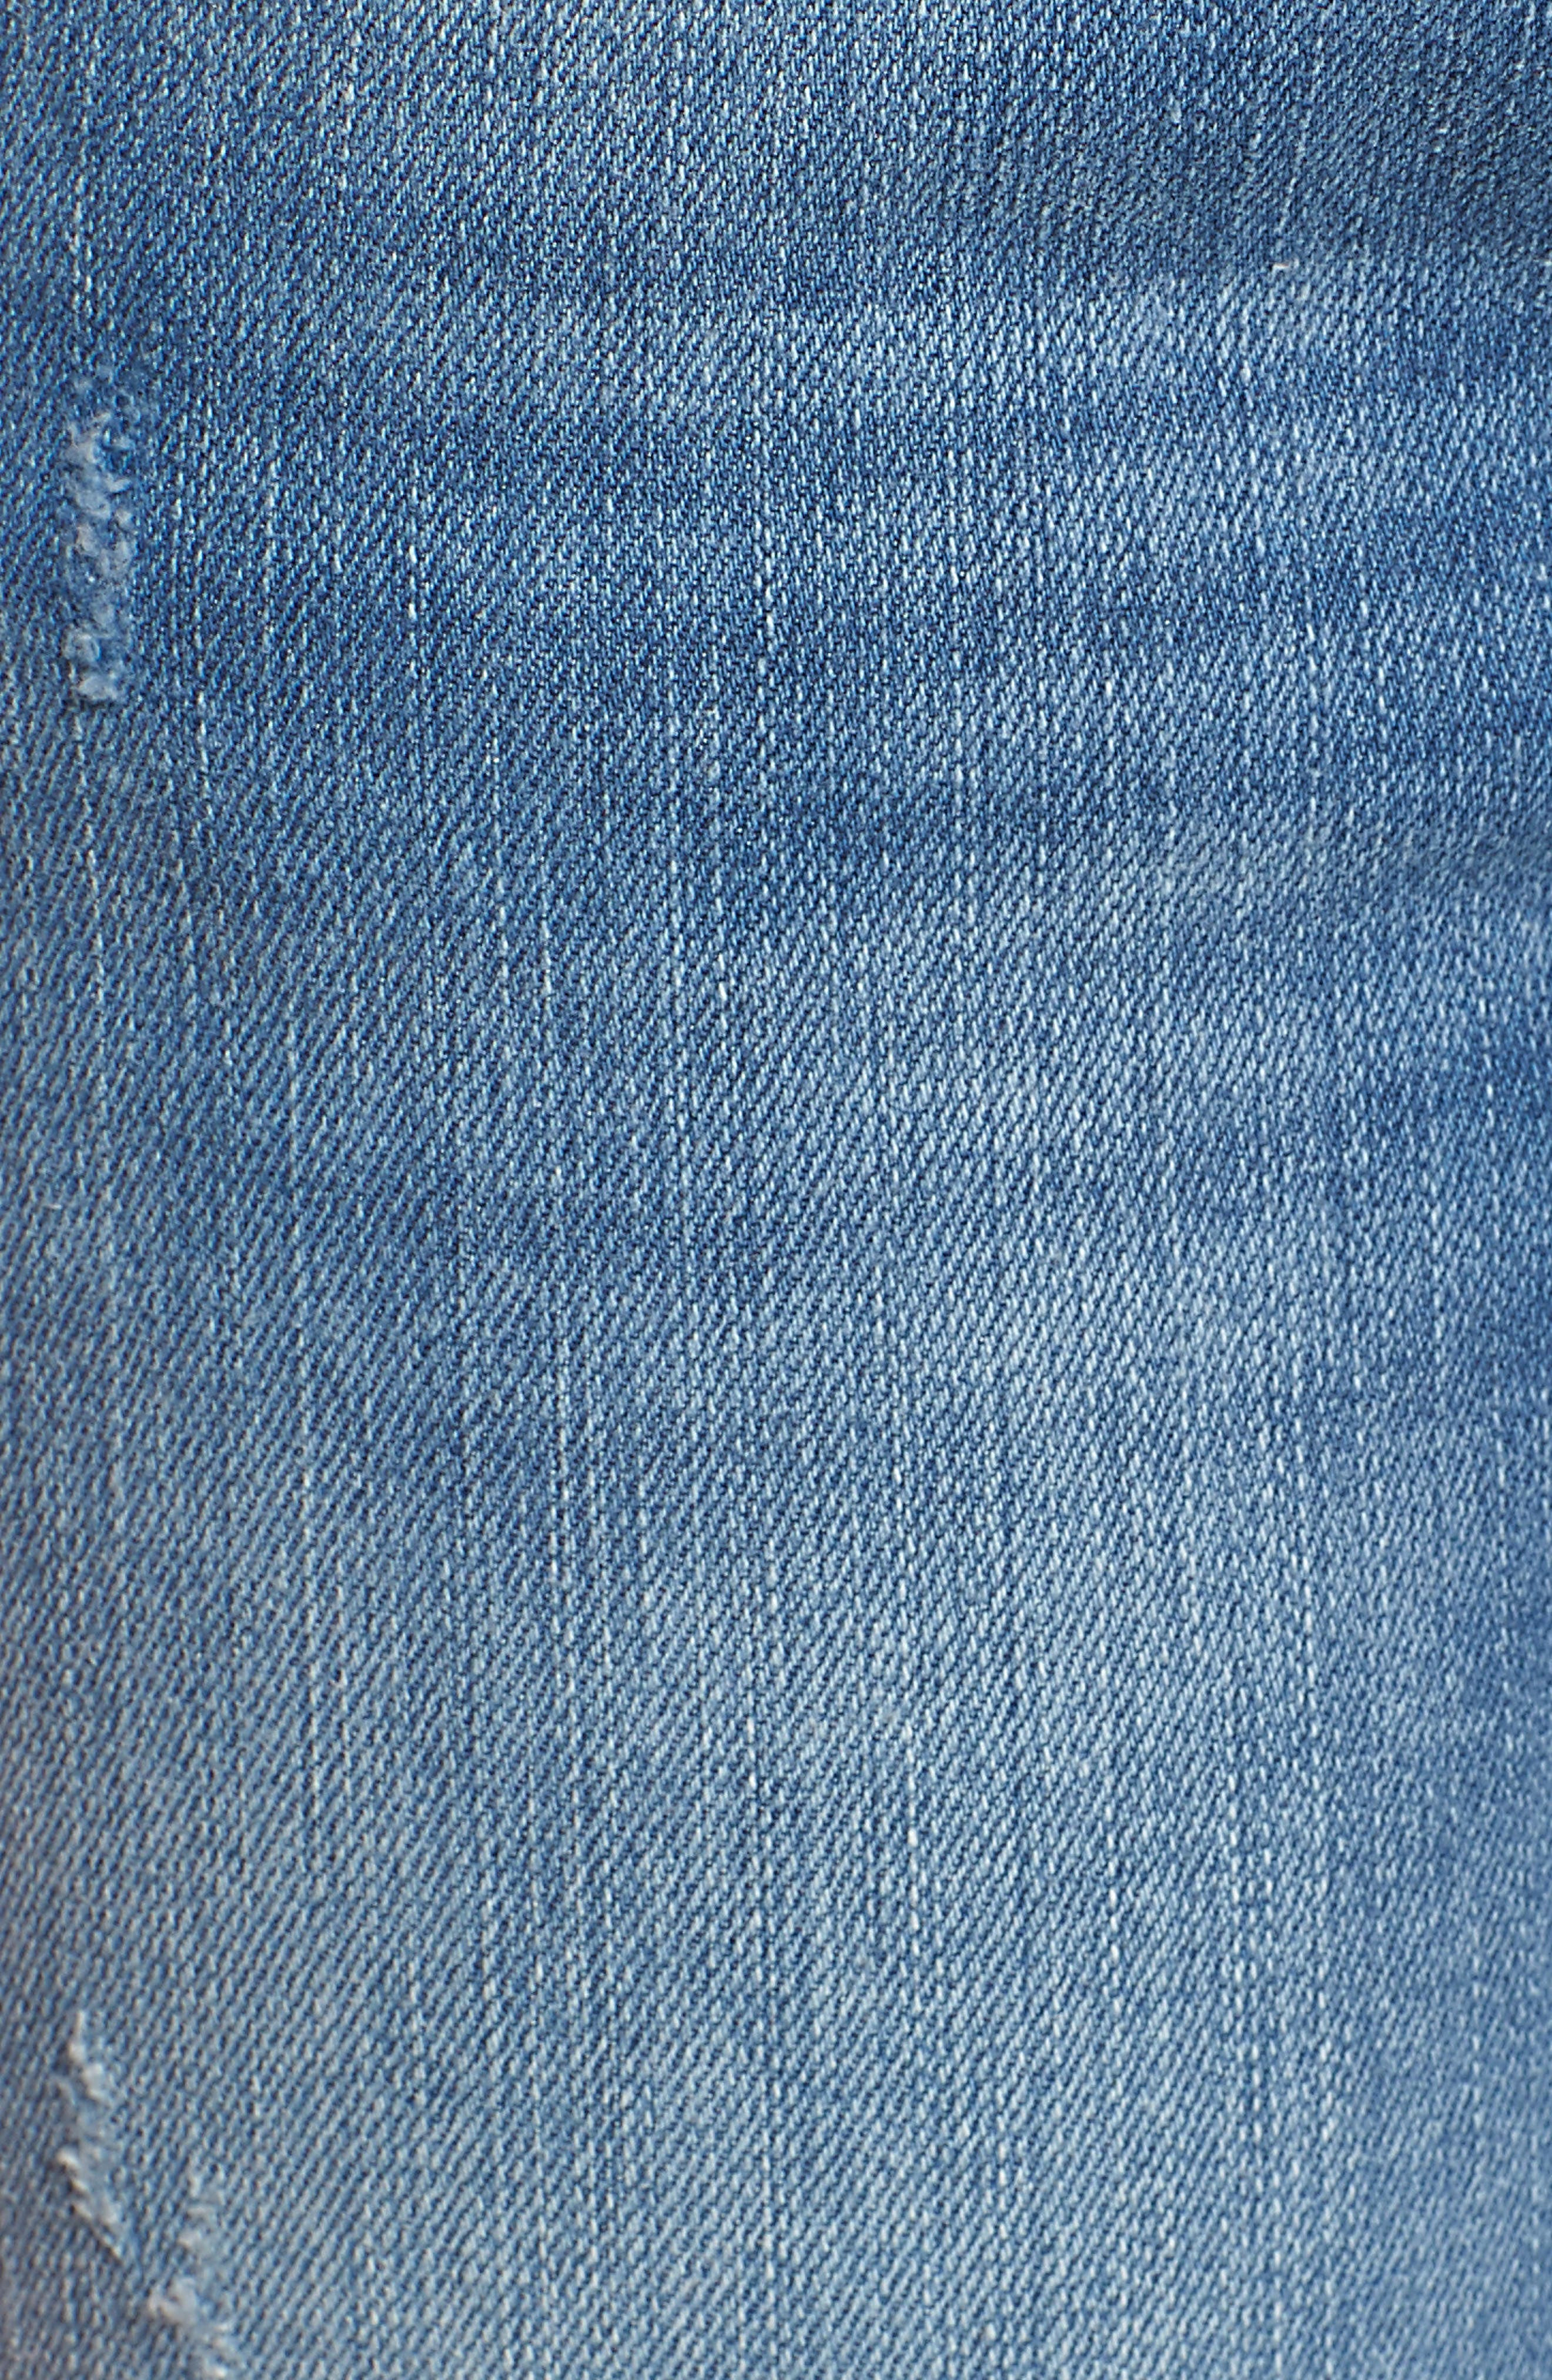 Kerry Fringe Hem Ankle Jeans,                             Alternate thumbnail 6, color,                             420